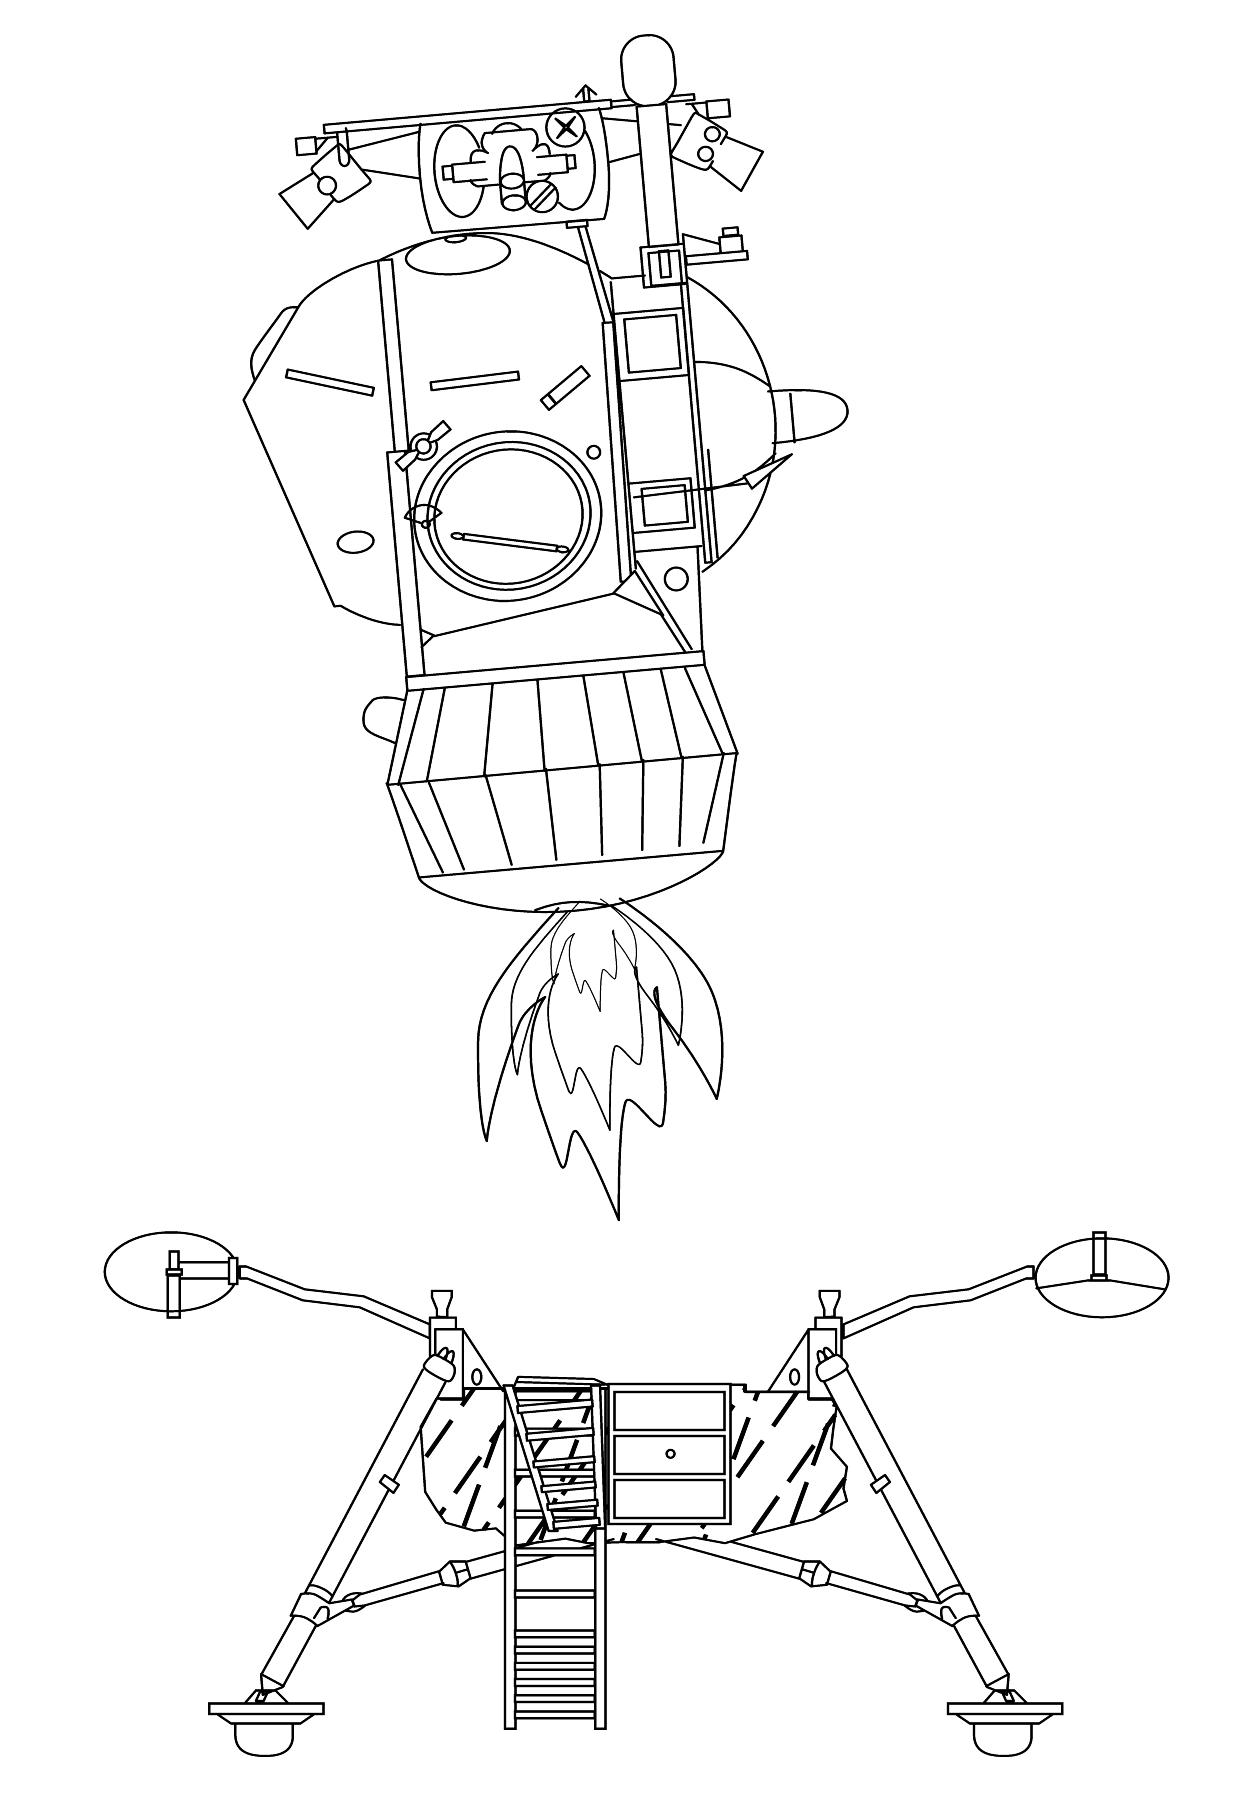 drawing apollo 11 moon lander - photo #17